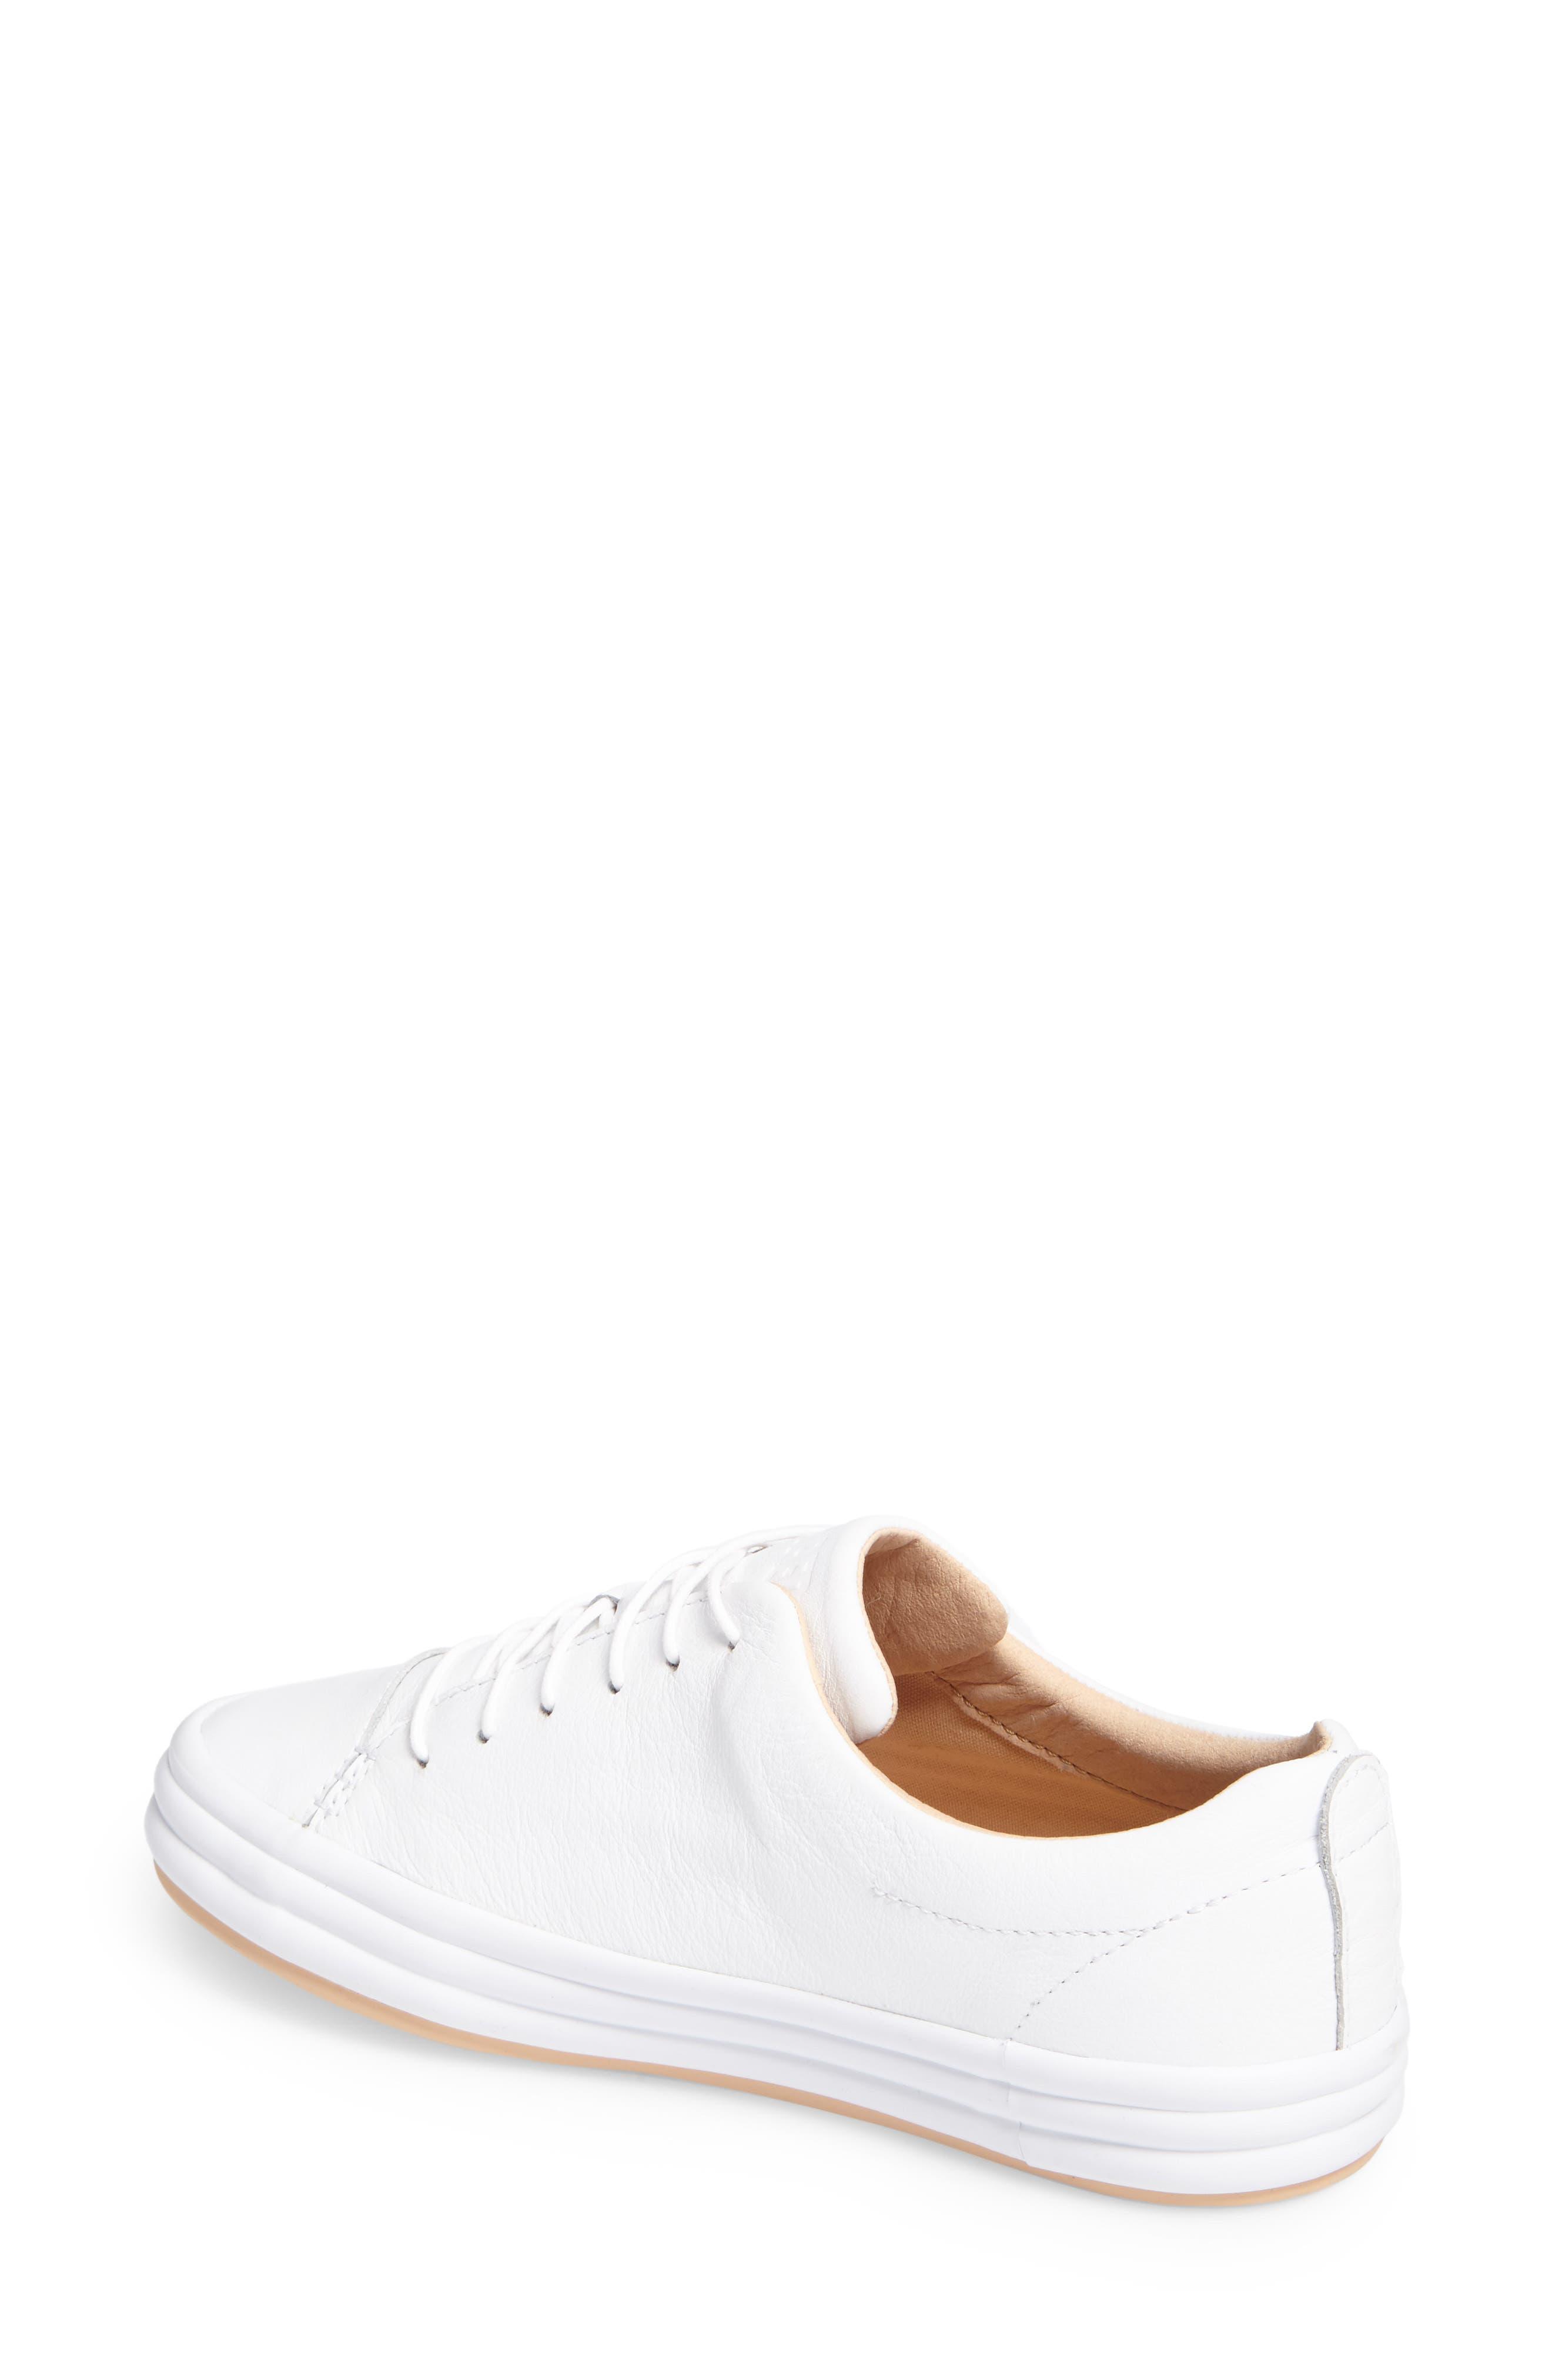 Hoops Sneaker,                             Alternate thumbnail 2, color,                             White Leather